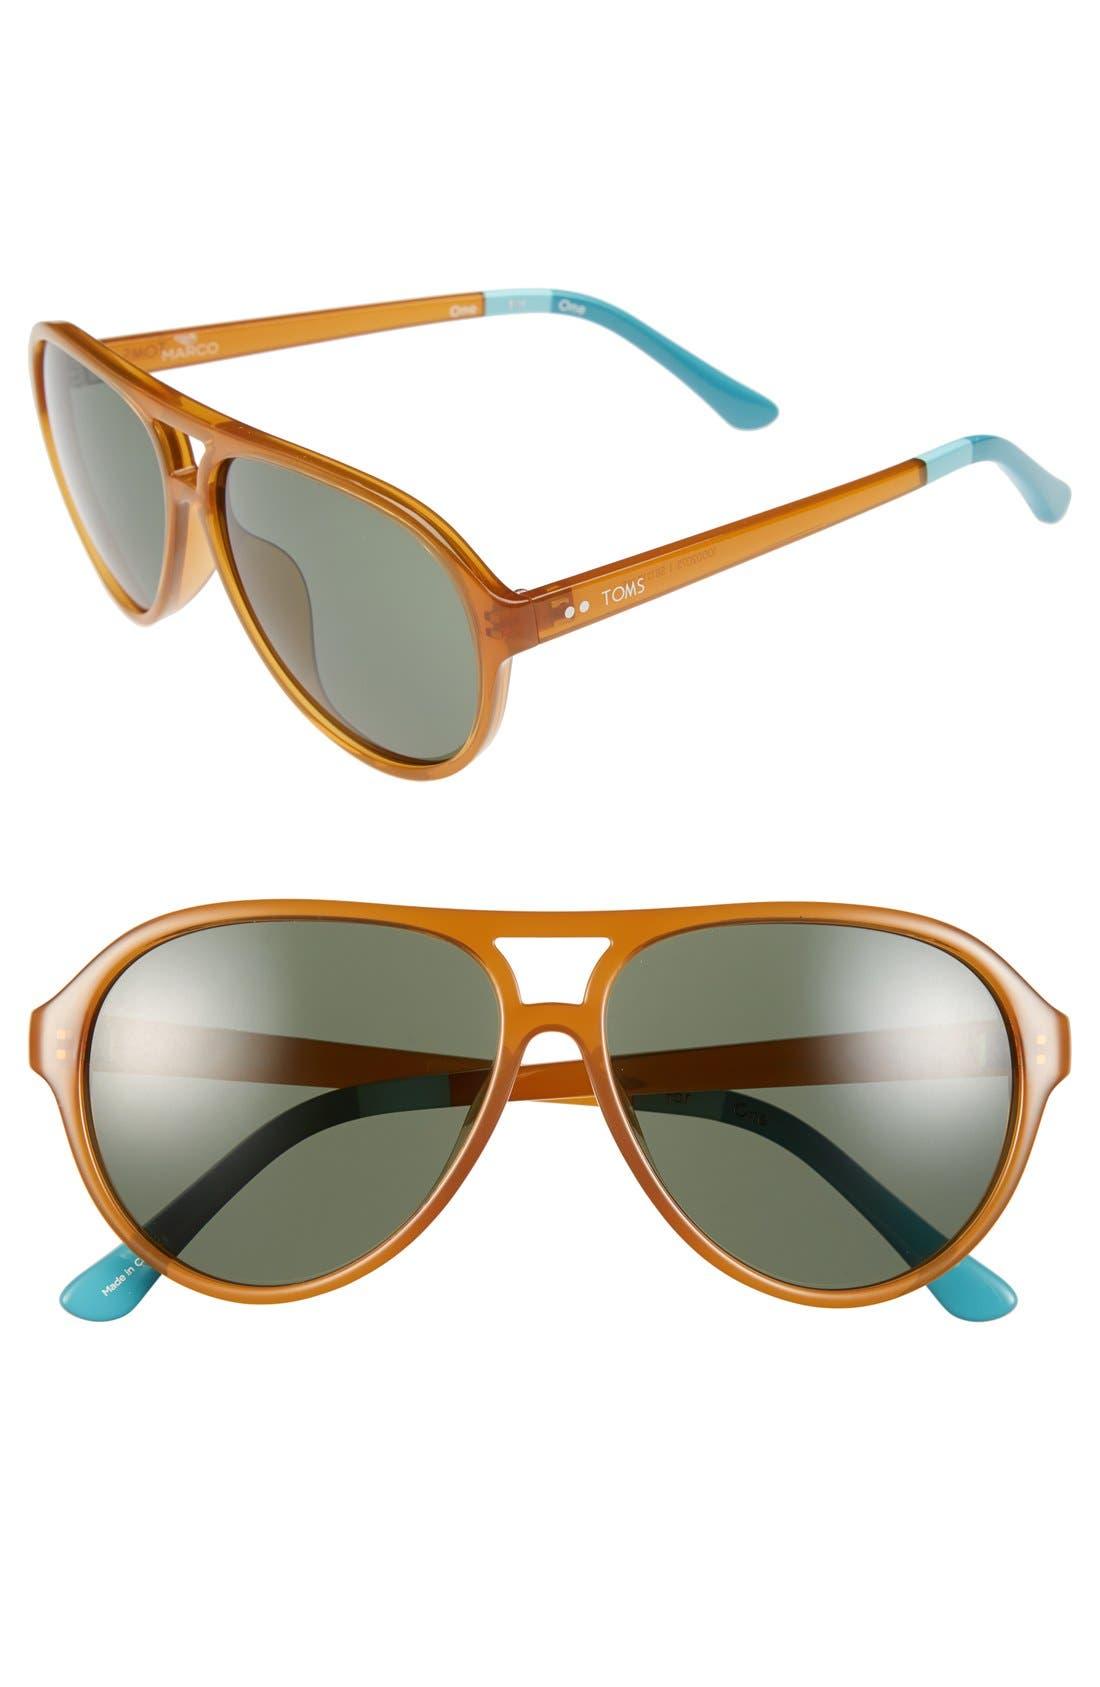 TOMS 'Marco' 58mm Aviator Sunglasses, Main, color, 220